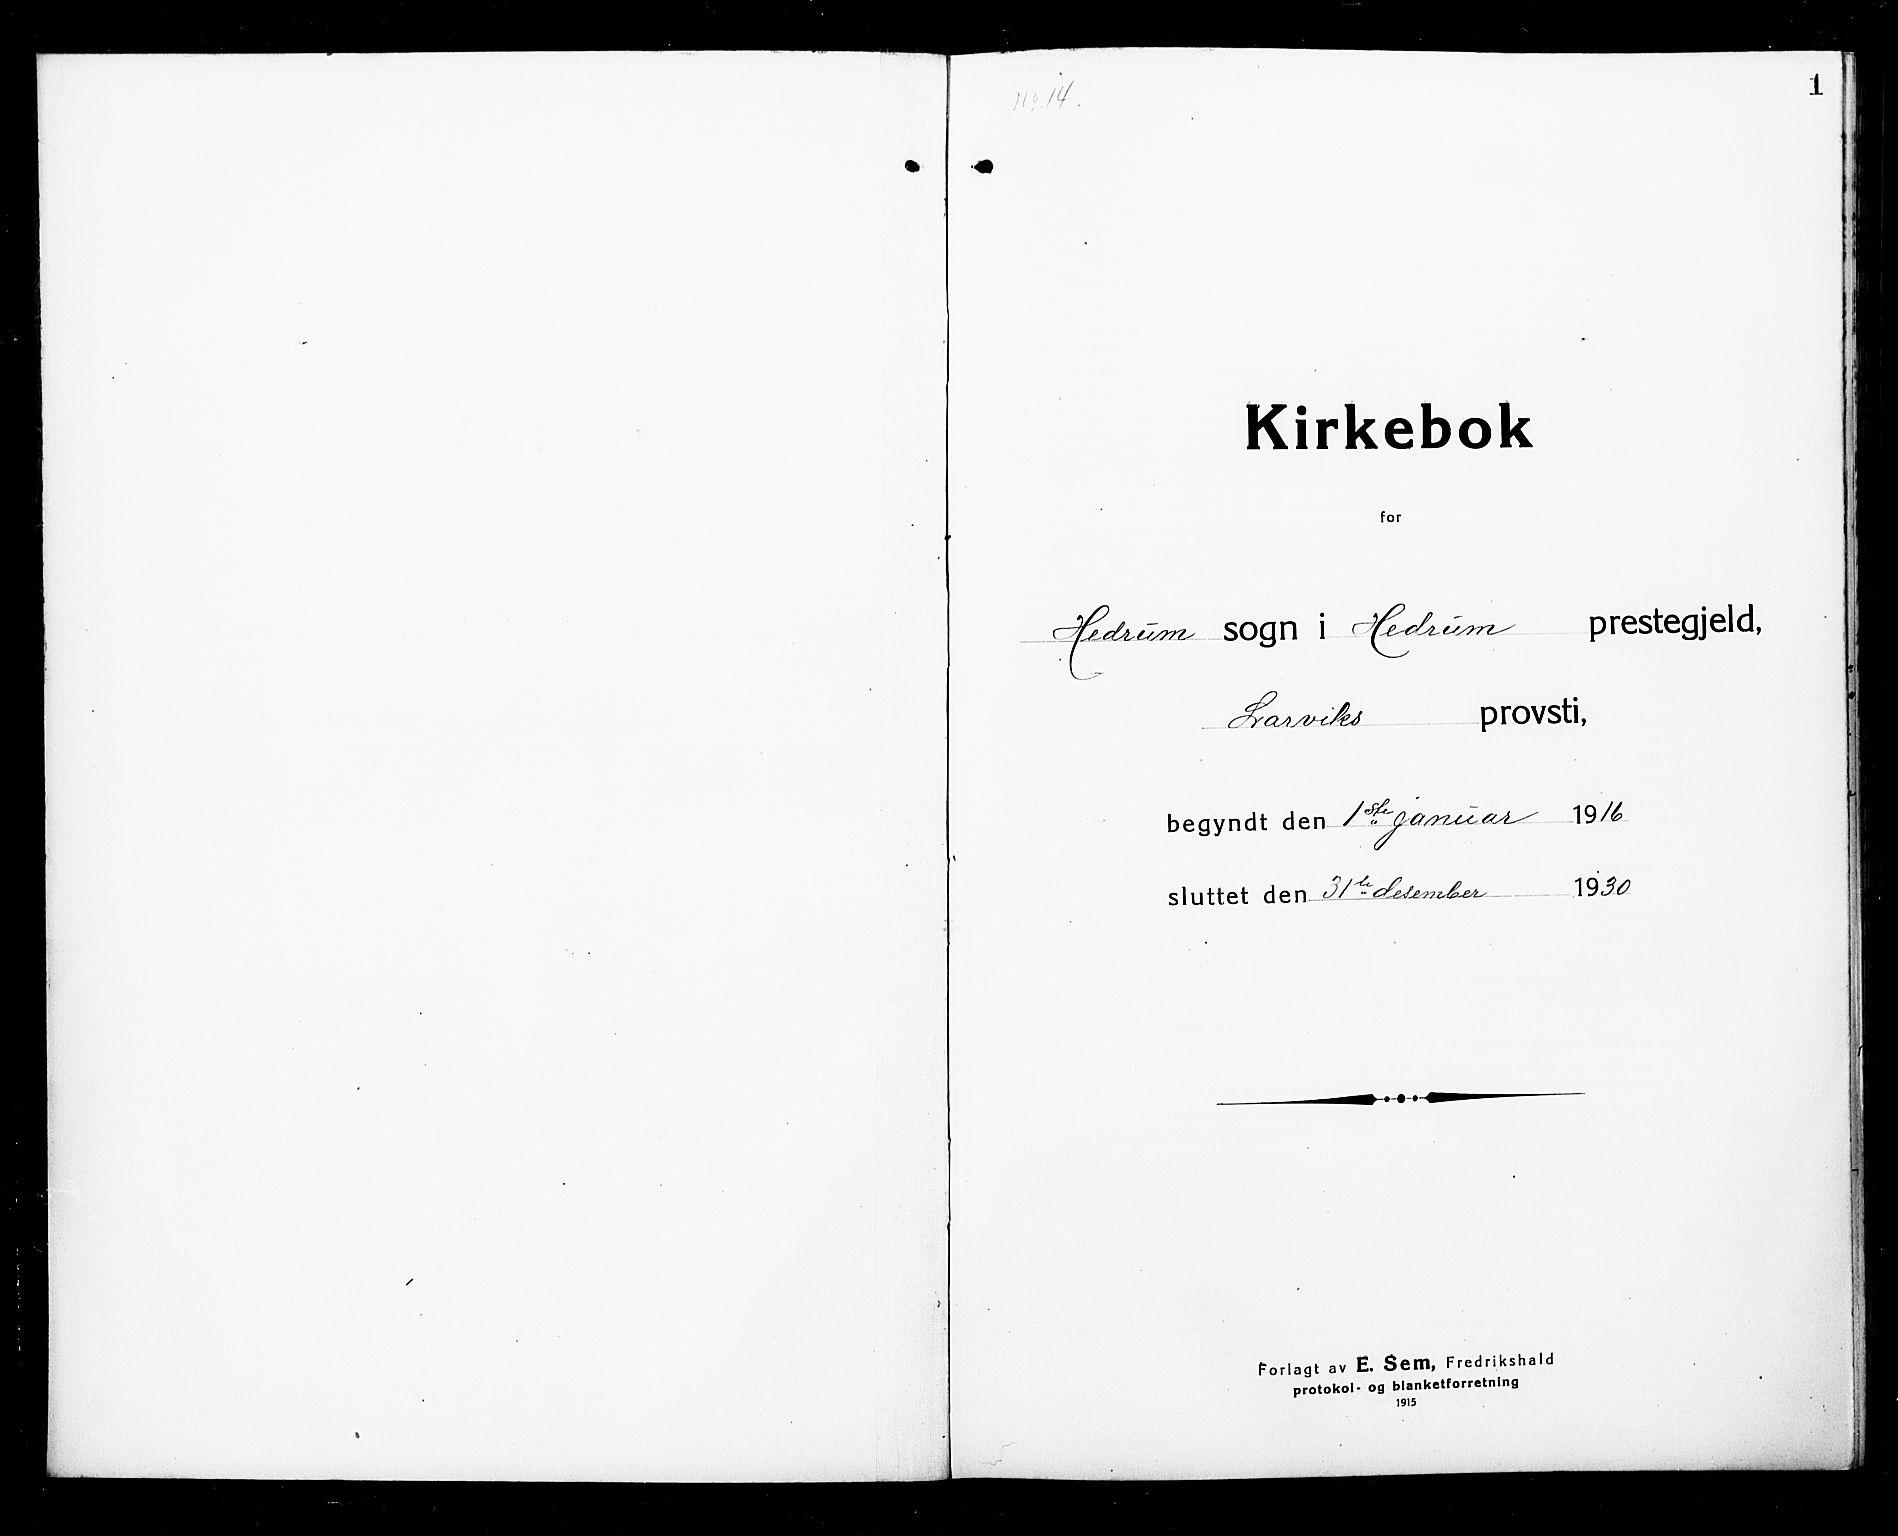 SAKO, Hedrum kirkebøker, G/Ga/L0005: Klokkerbok nr. I 5, 1916-1930, s. 1